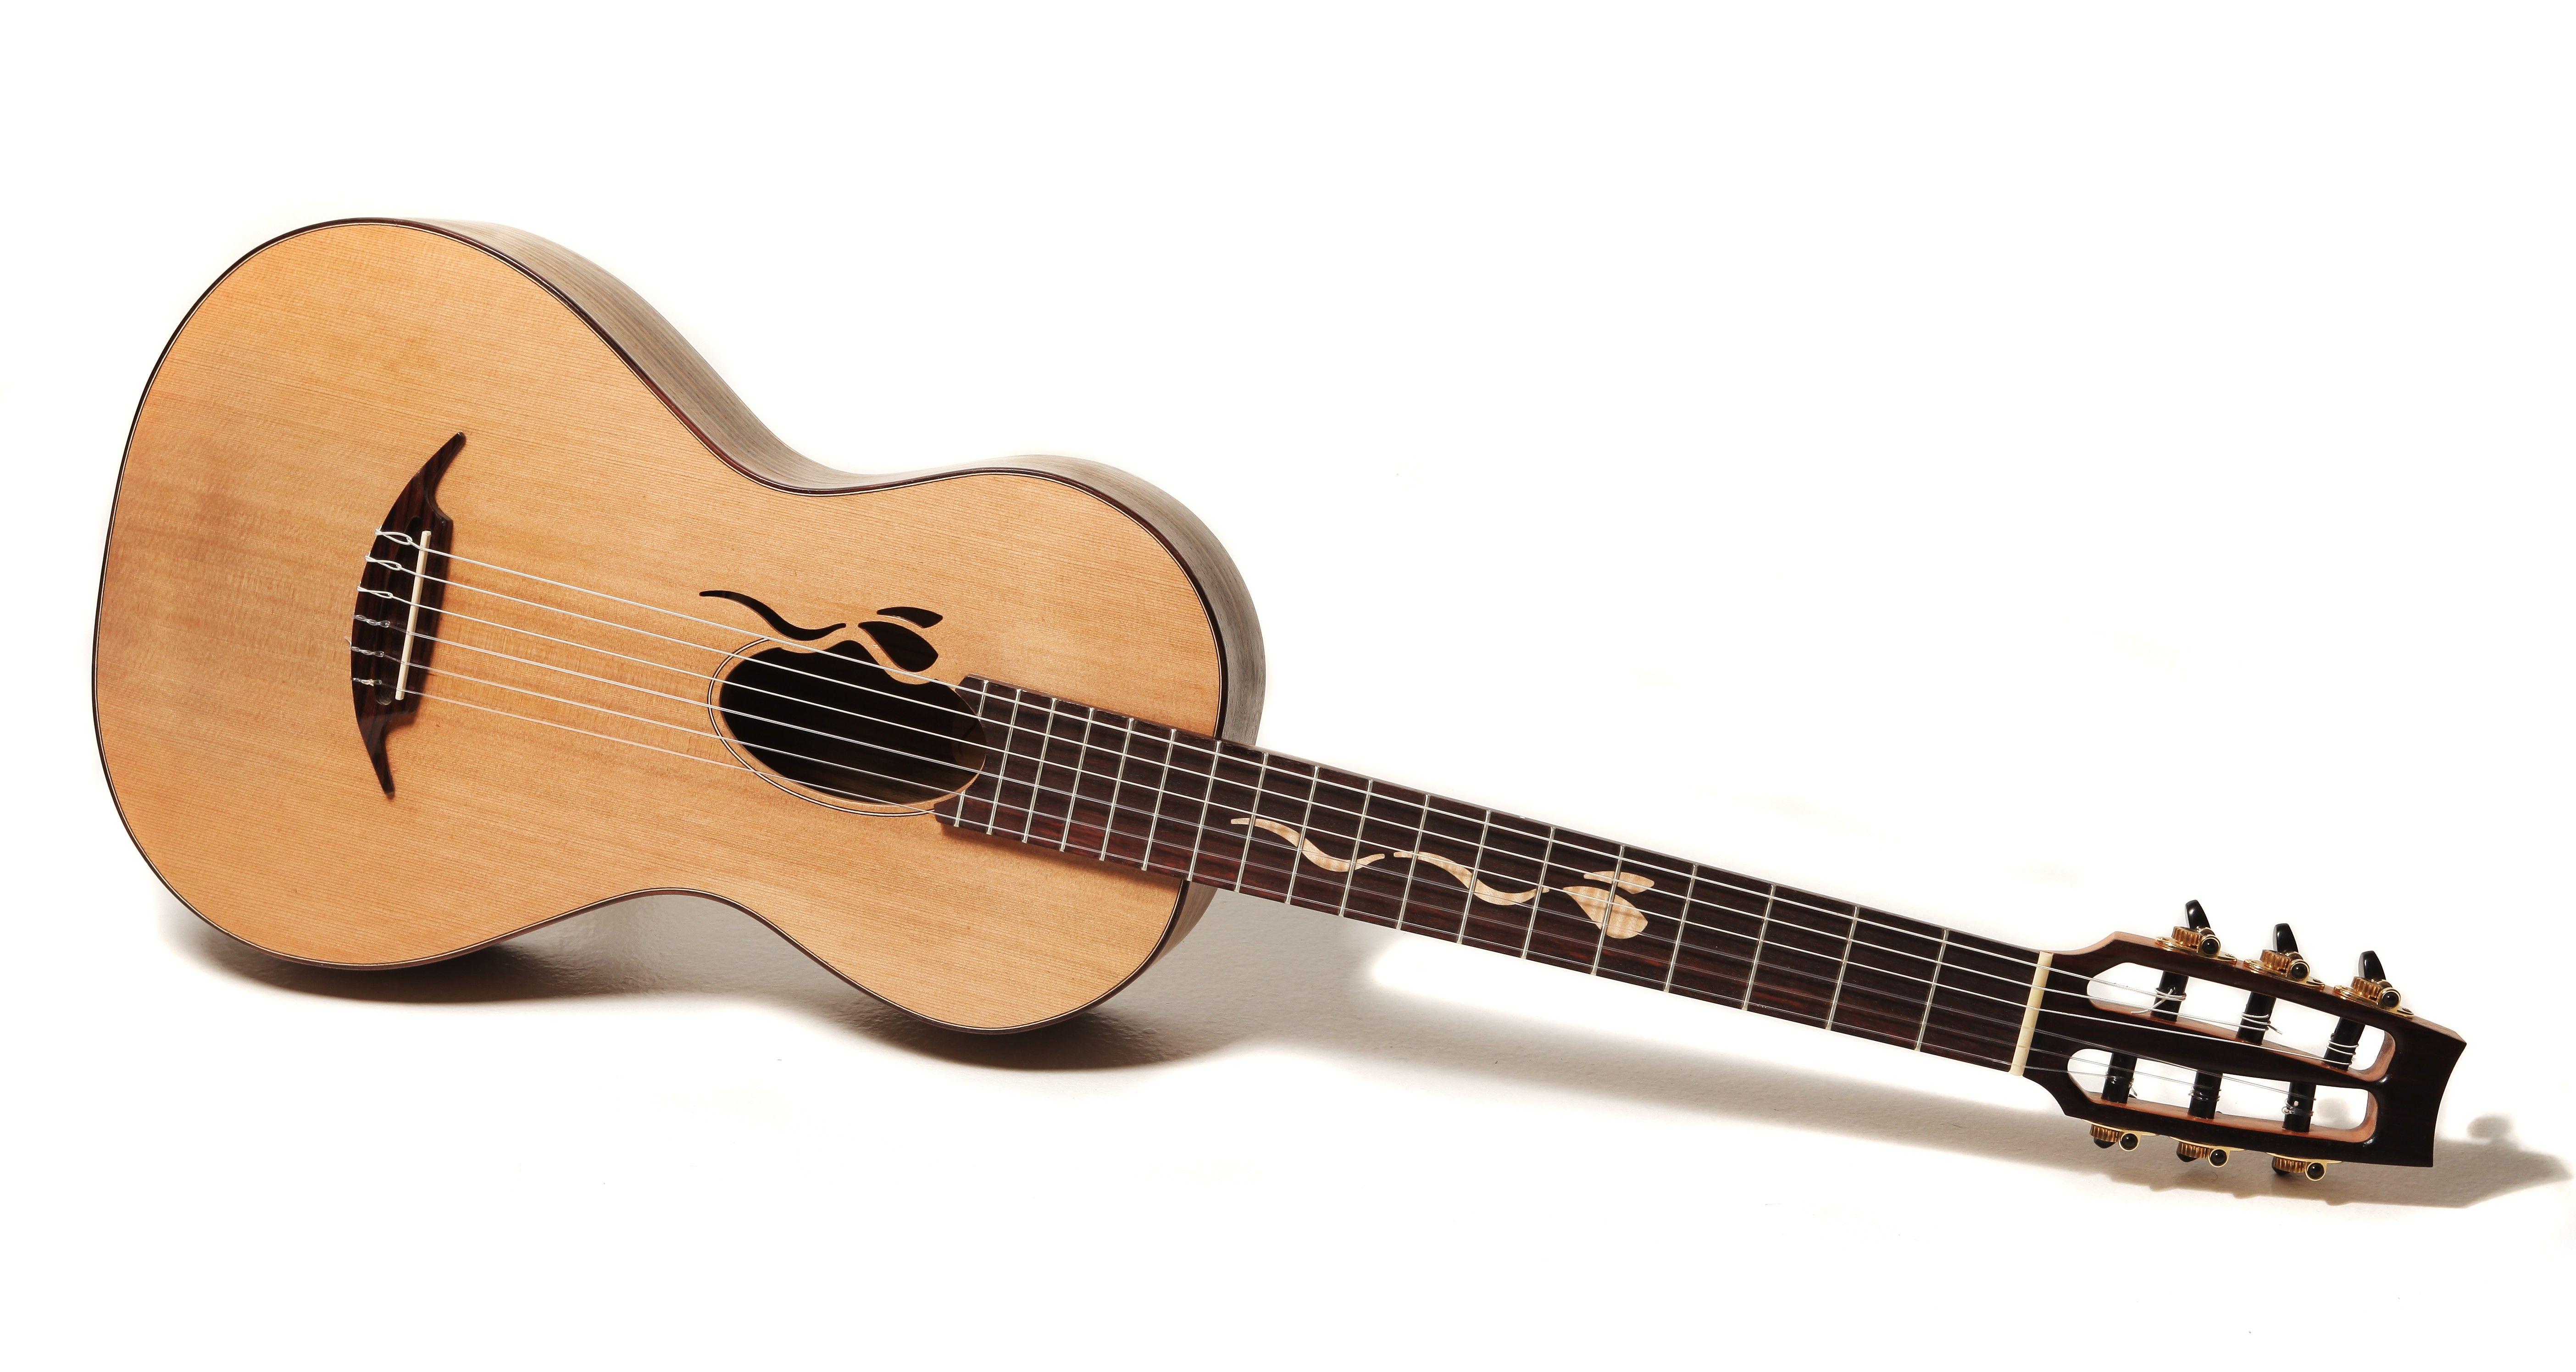 la petite small body 19th century style nylon string guitar murray kuun guitar design. Black Bedroom Furniture Sets. Home Design Ideas